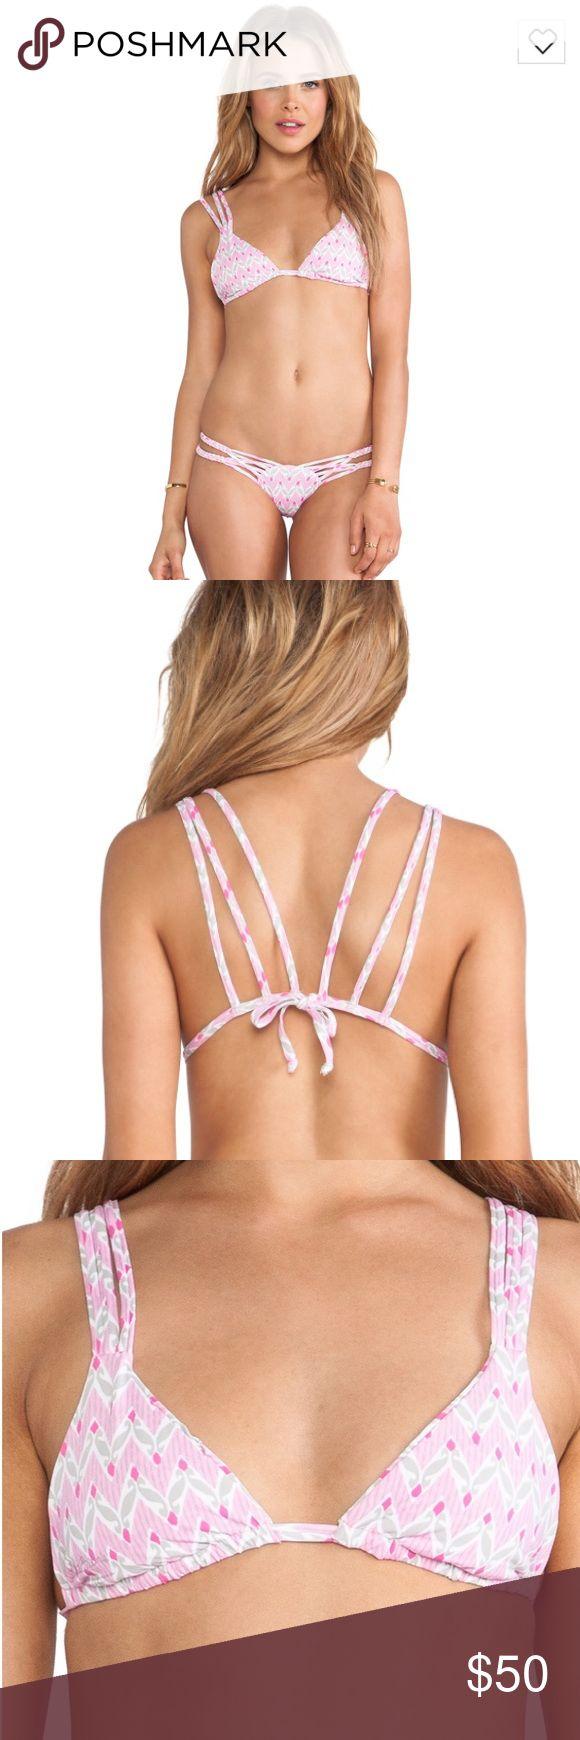 Frankie's bikini pink chevron bikini top Only worn once, cute bikini top. Lots of straps that make a cute back tie. Frankie's bikini brand :) Runs small!!! Frankie's Bikinis Swim Bikinis